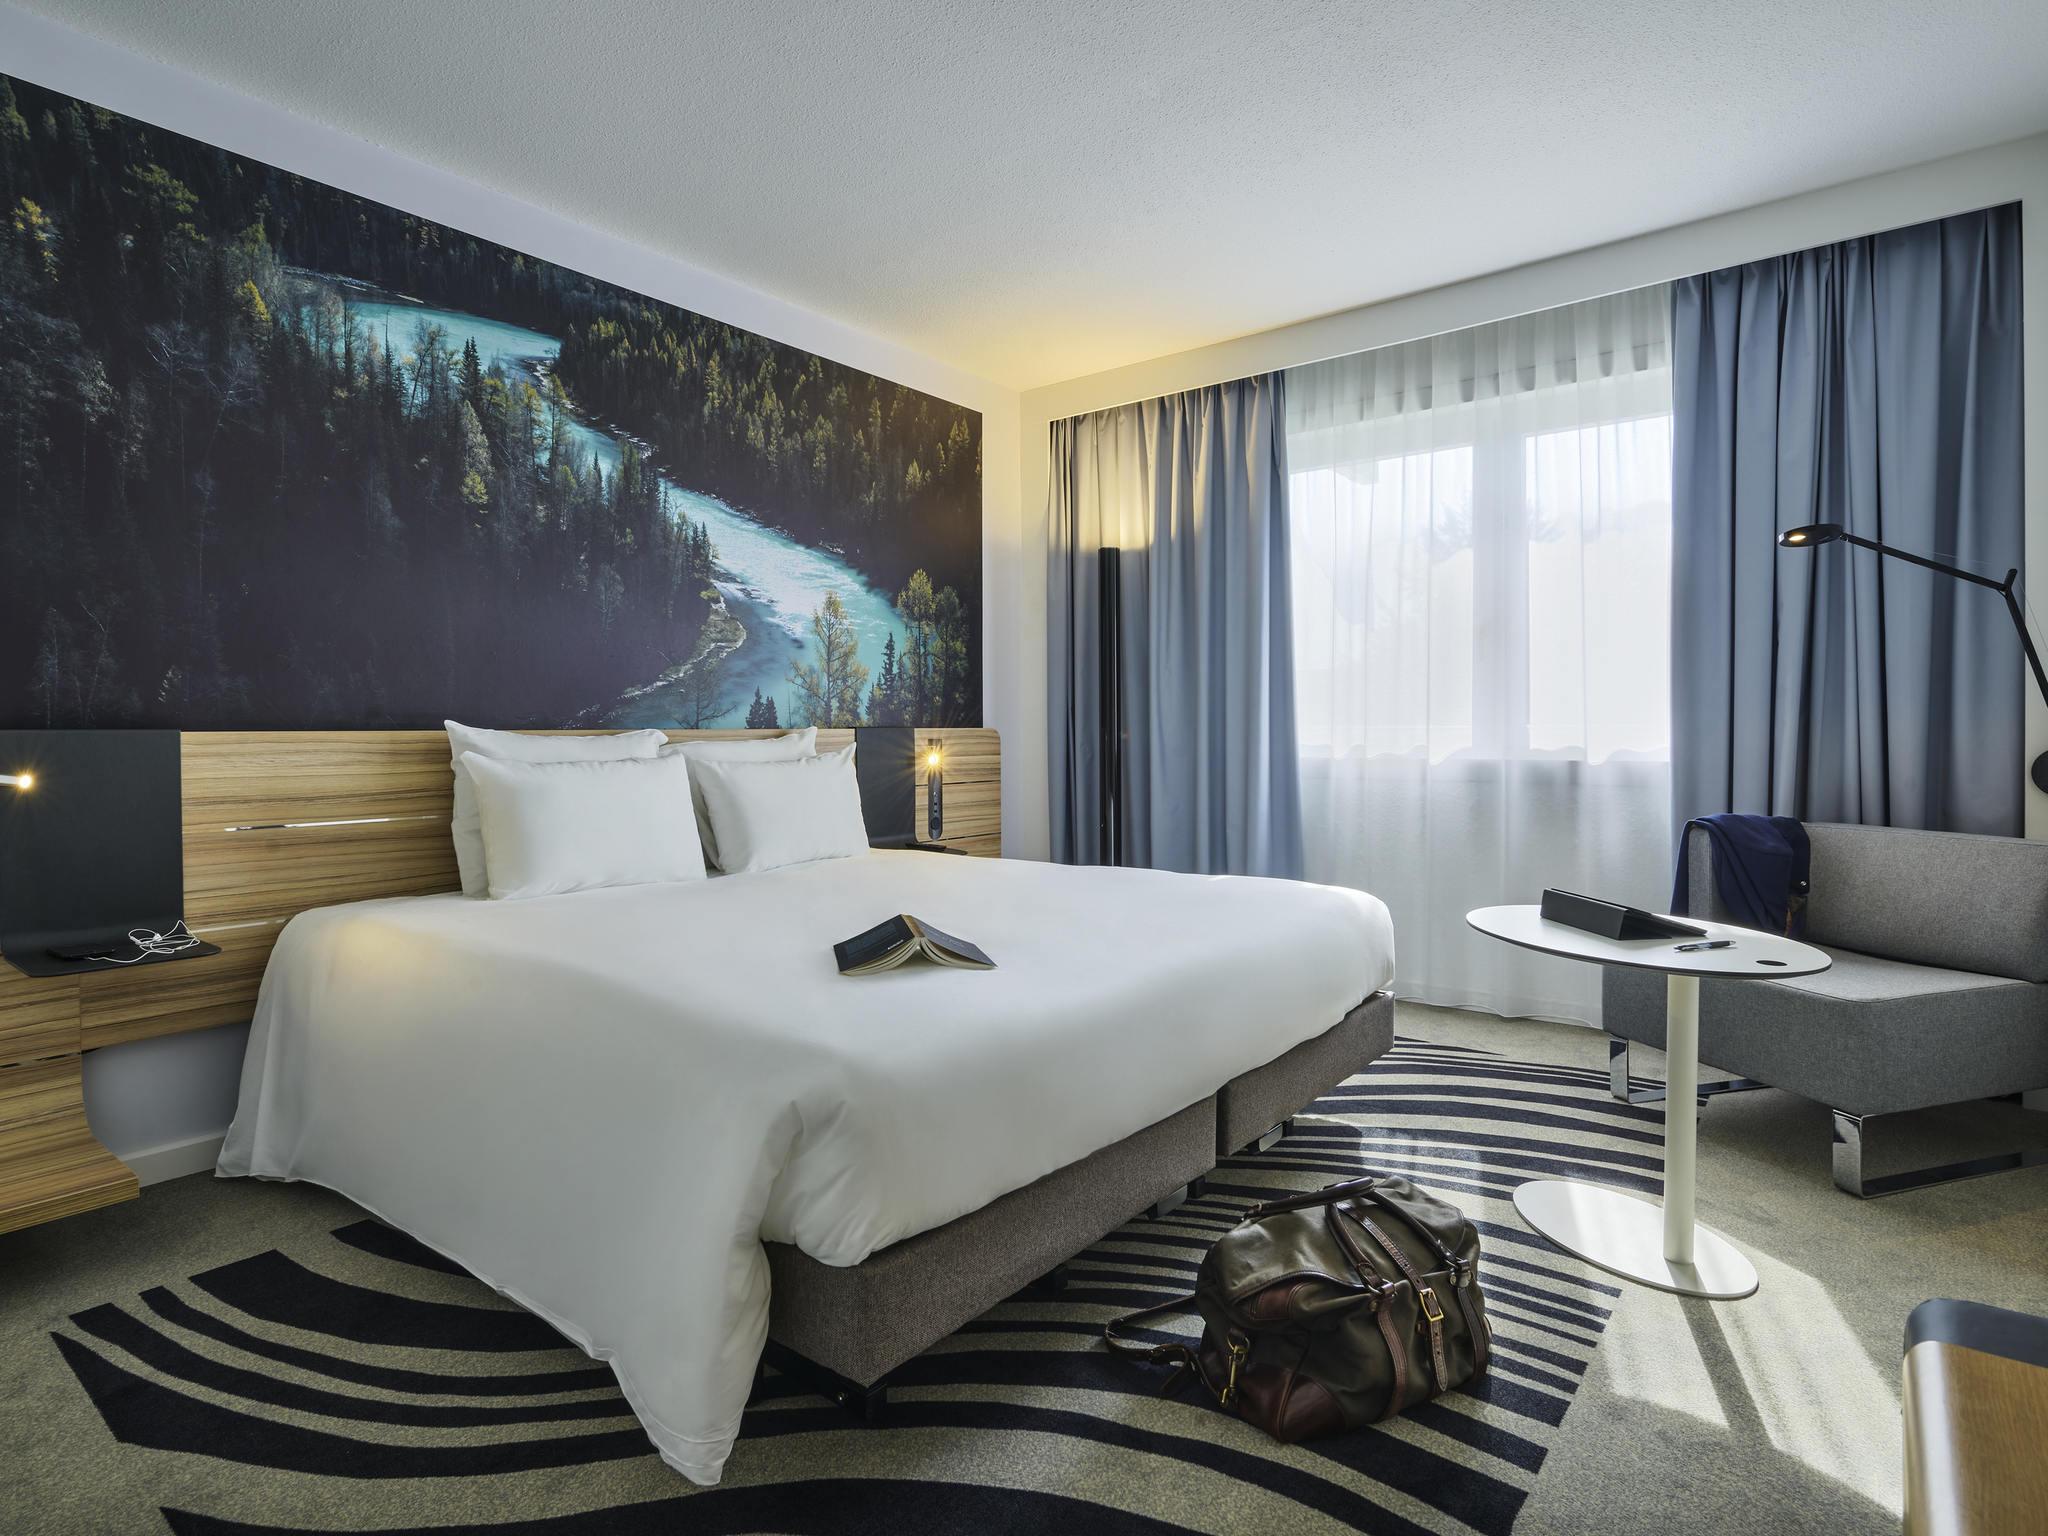 فندق - Novotel Massy Palaiseau